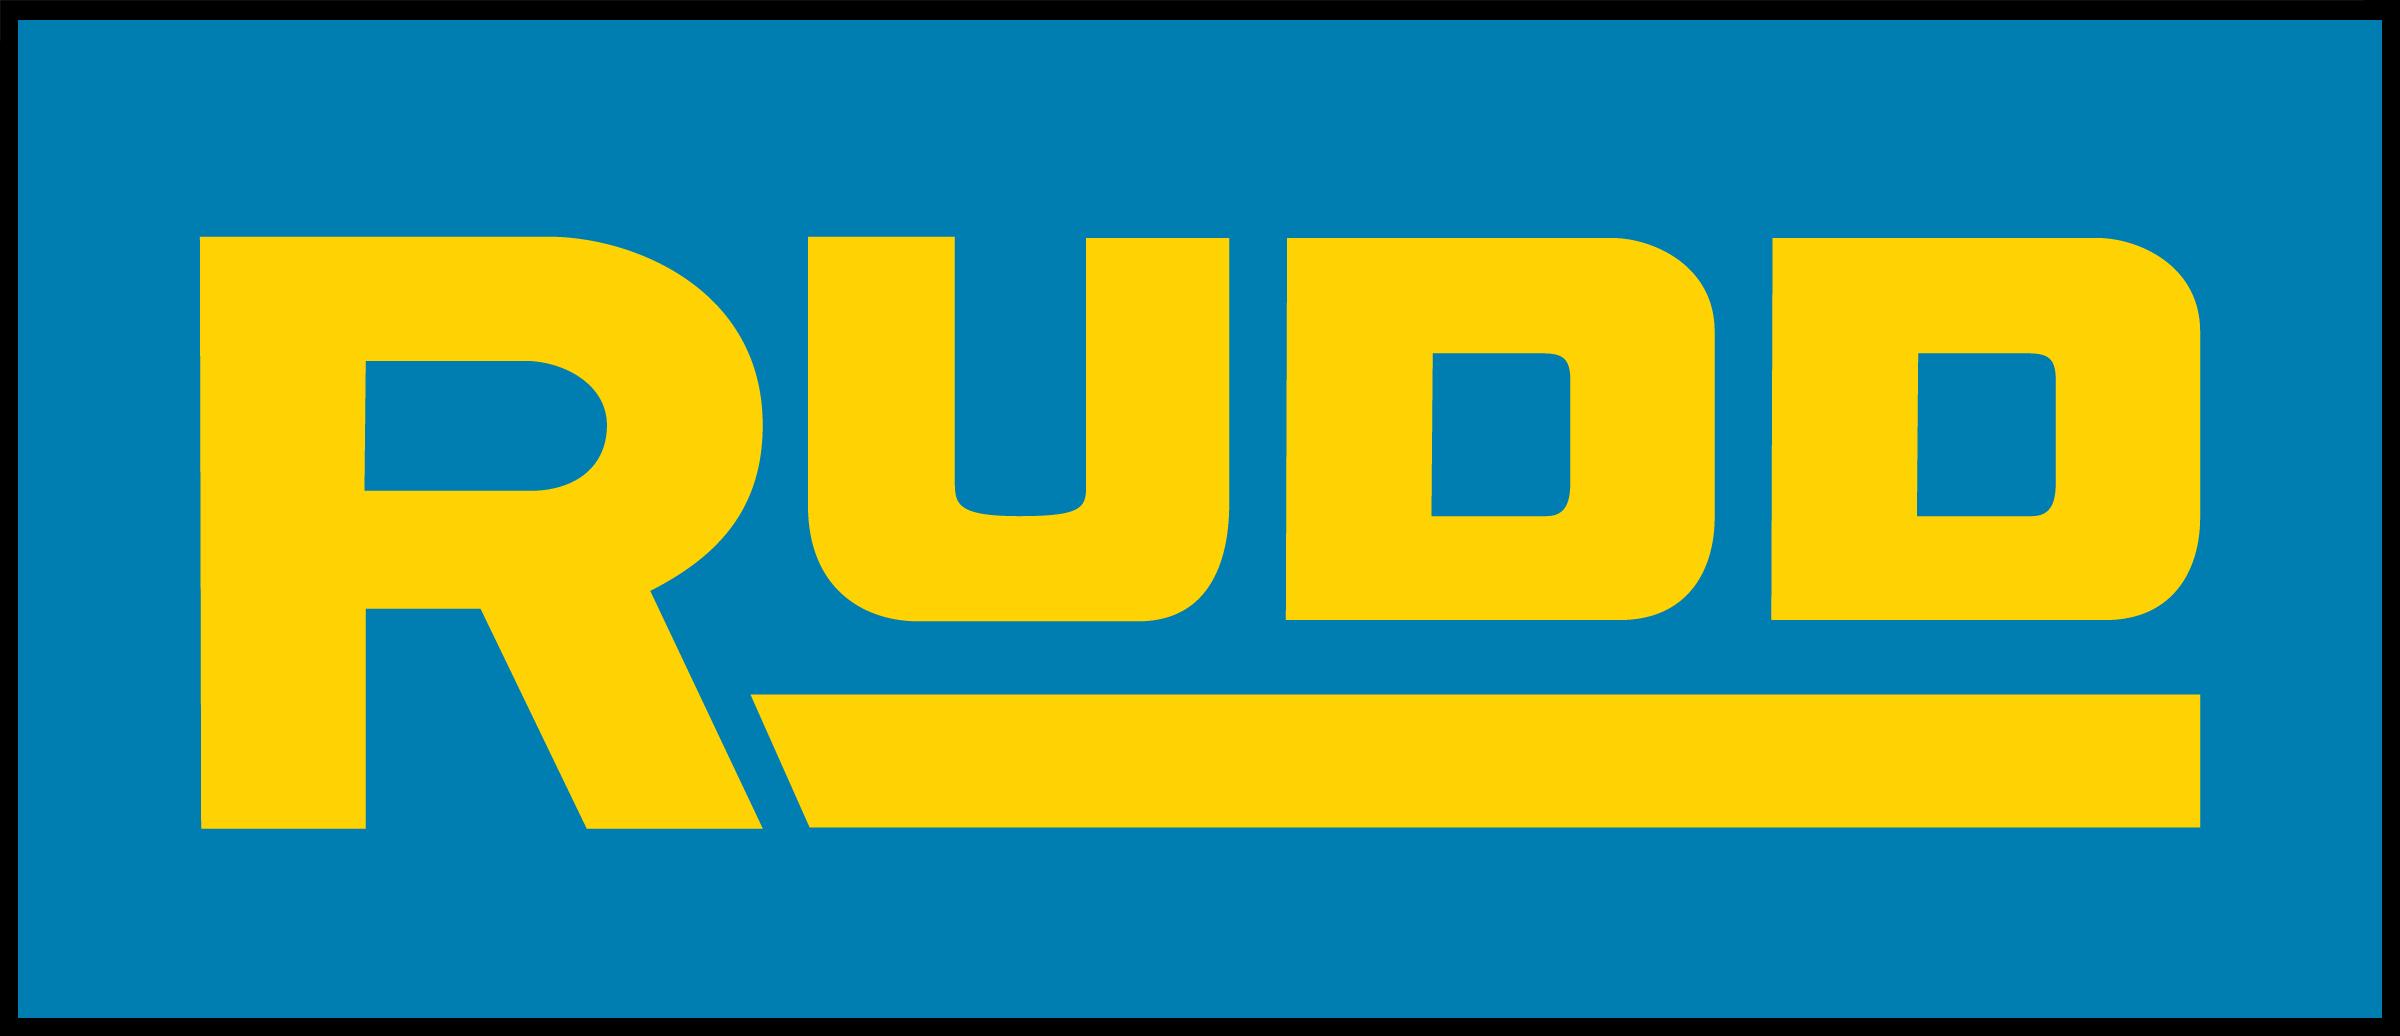 Rudd Equipment Company company logo